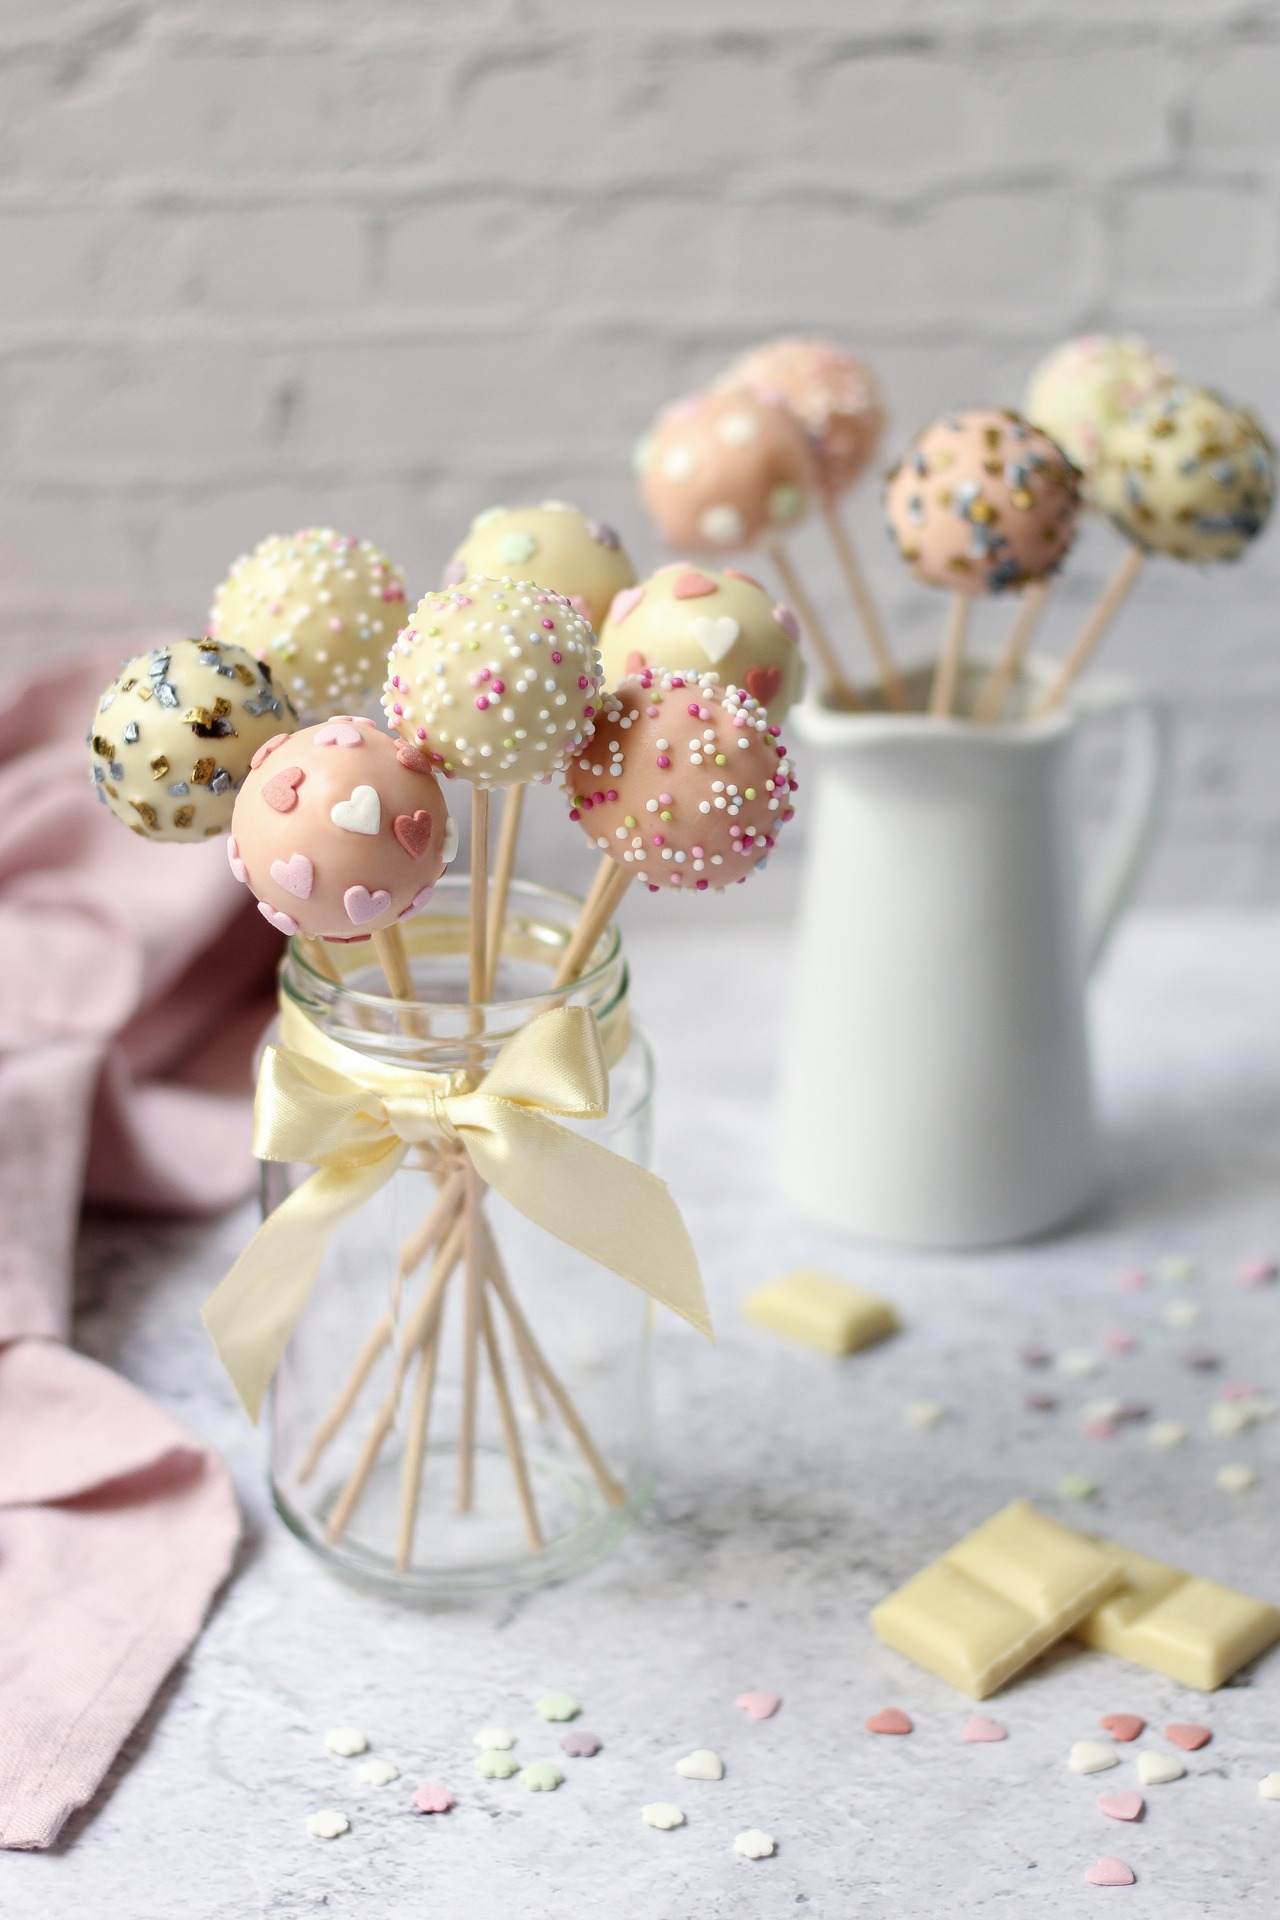 Kejk pops (cake pops) 1